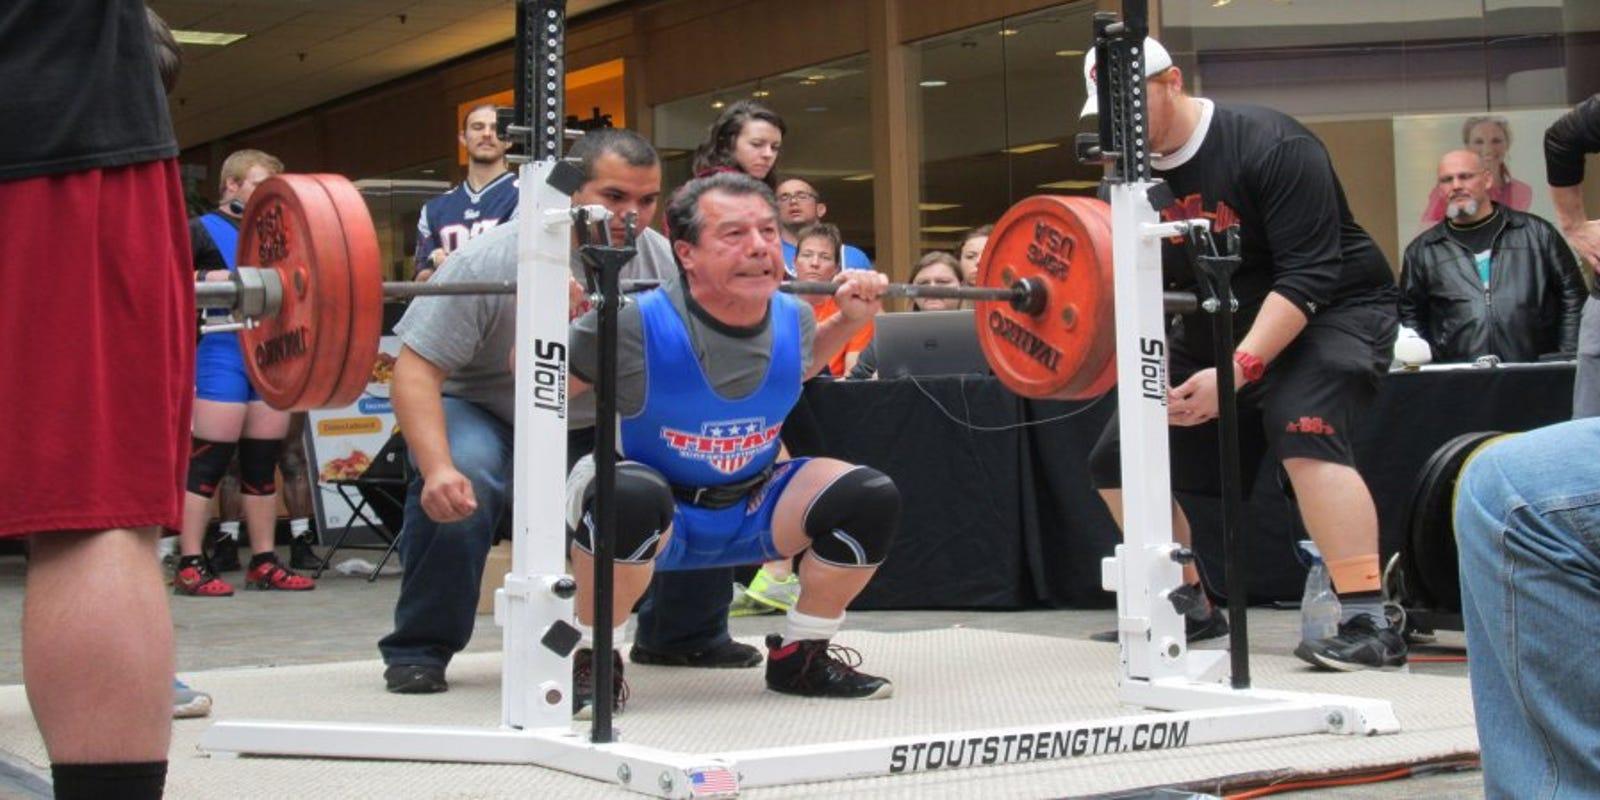 Sevierville powerlifter defying age, winning world titles